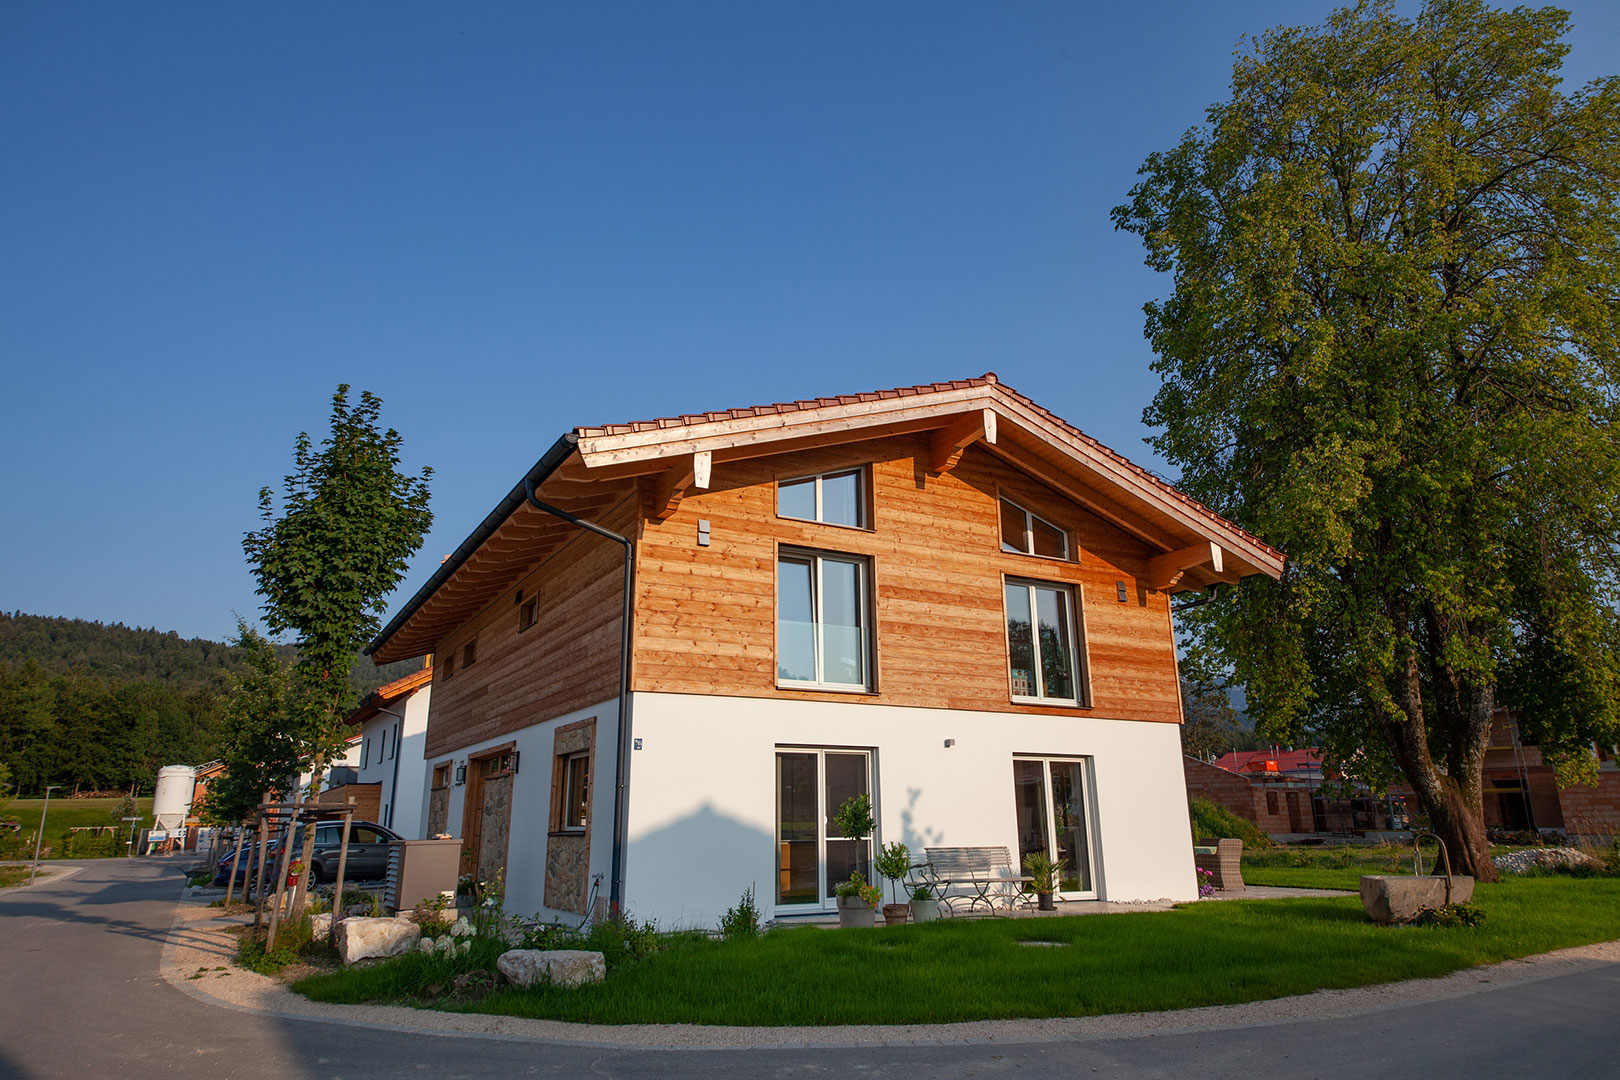 Kendler Holzhaus Hörgering